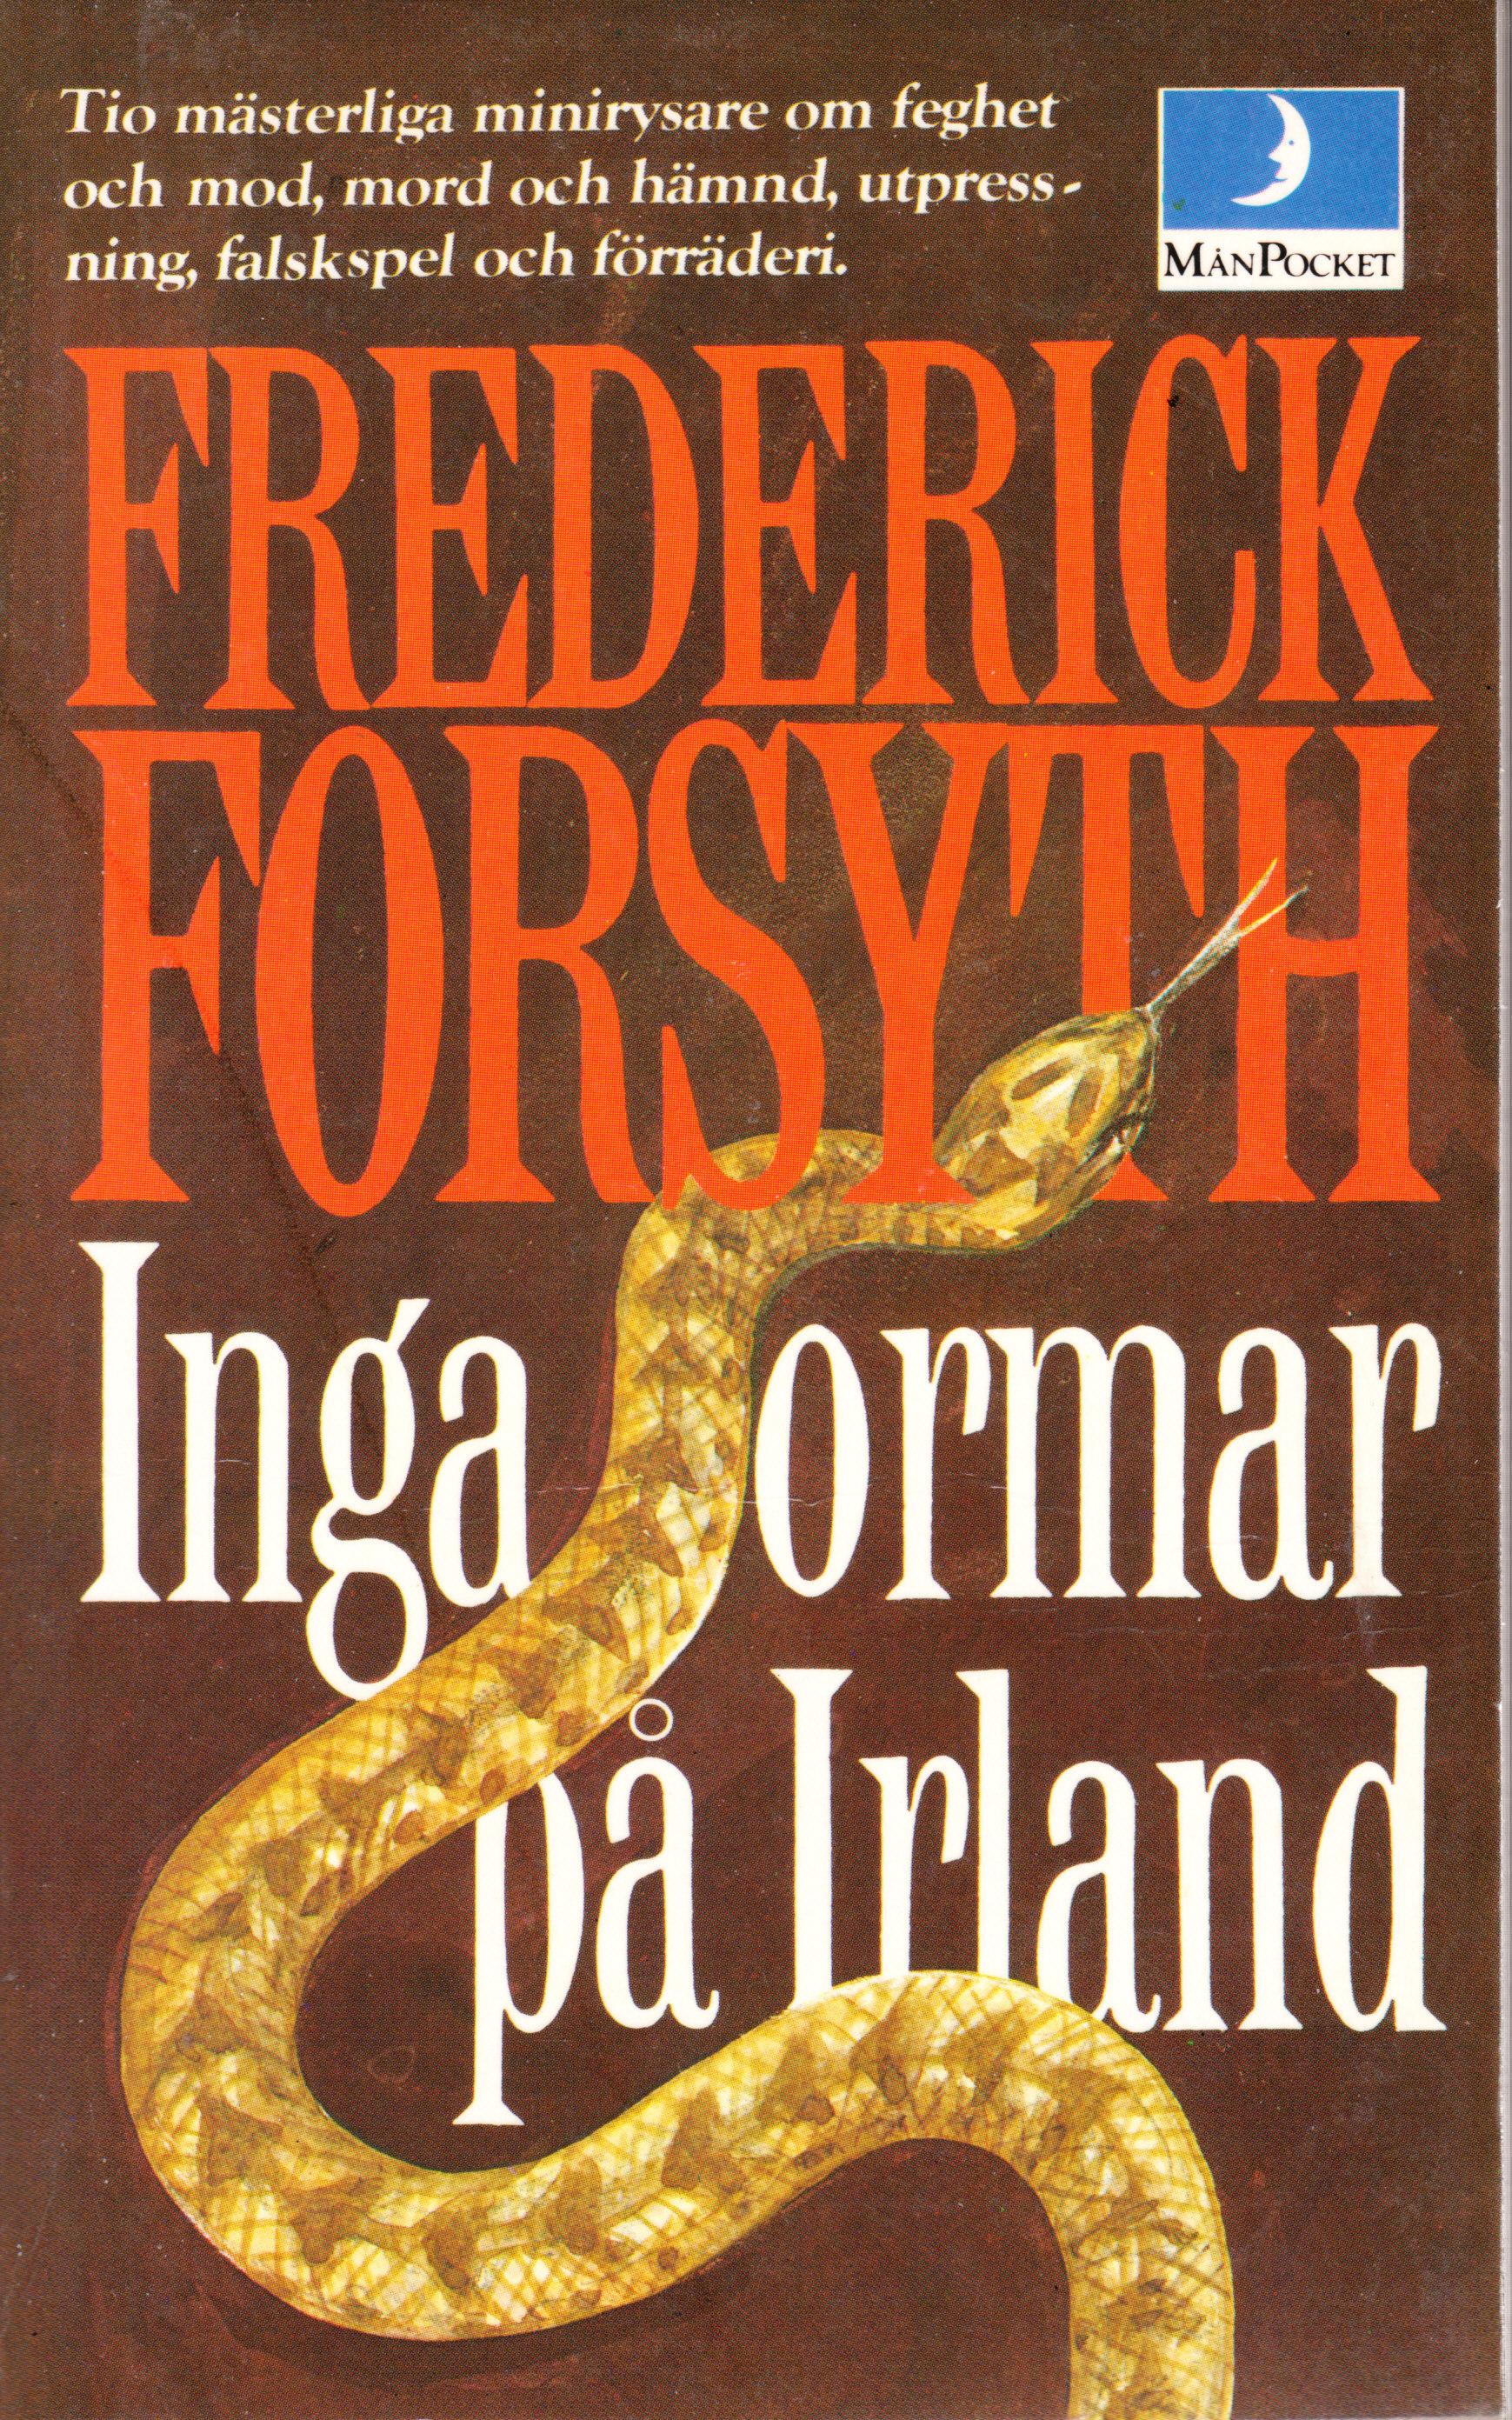 Inga ormar på Irland Frederick Forsyth